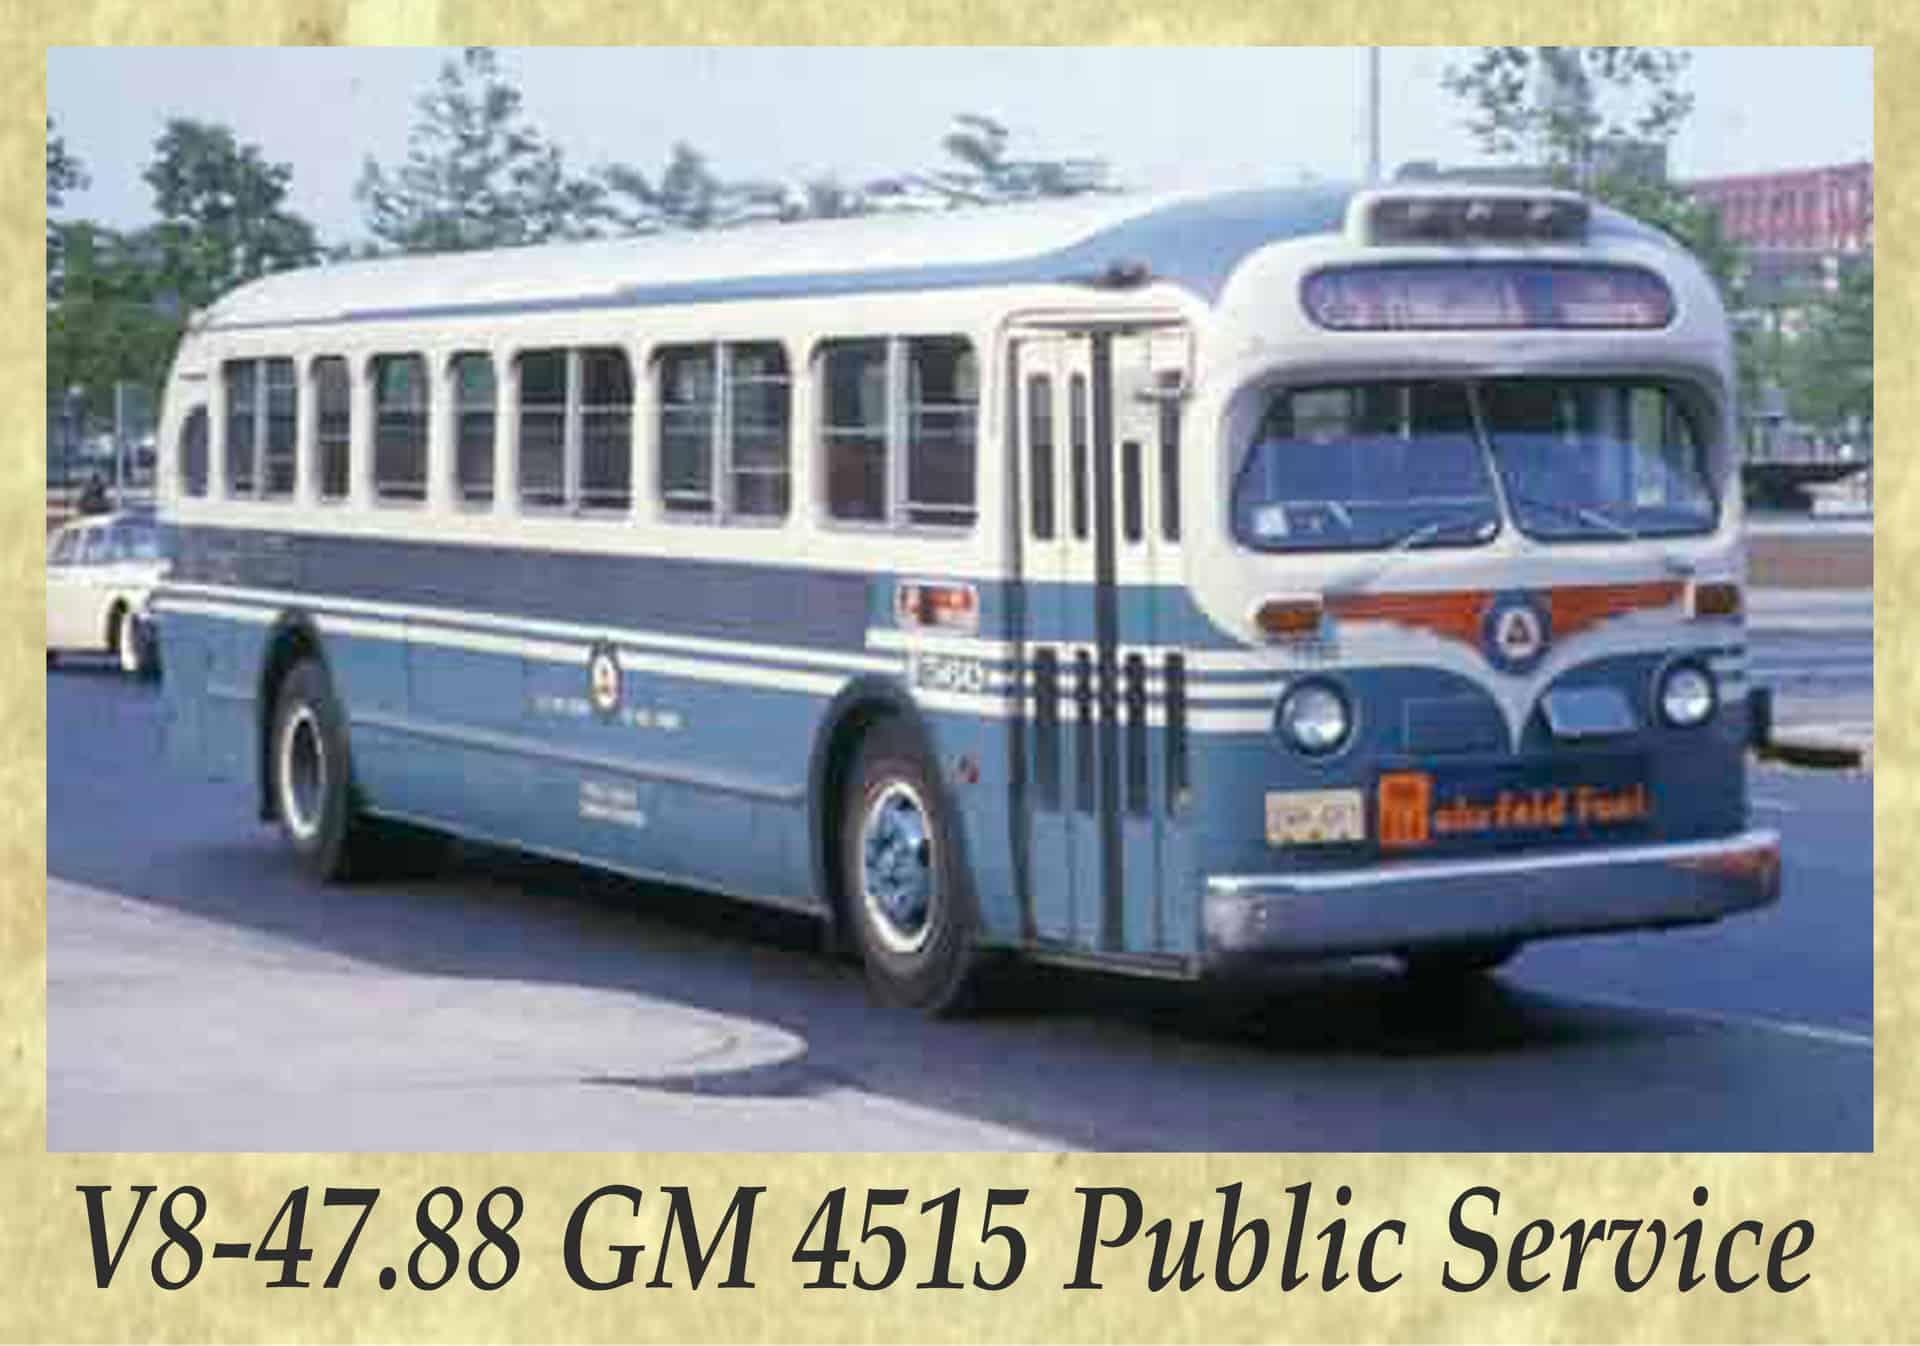 V8-47.88 GM 4515 Public Service